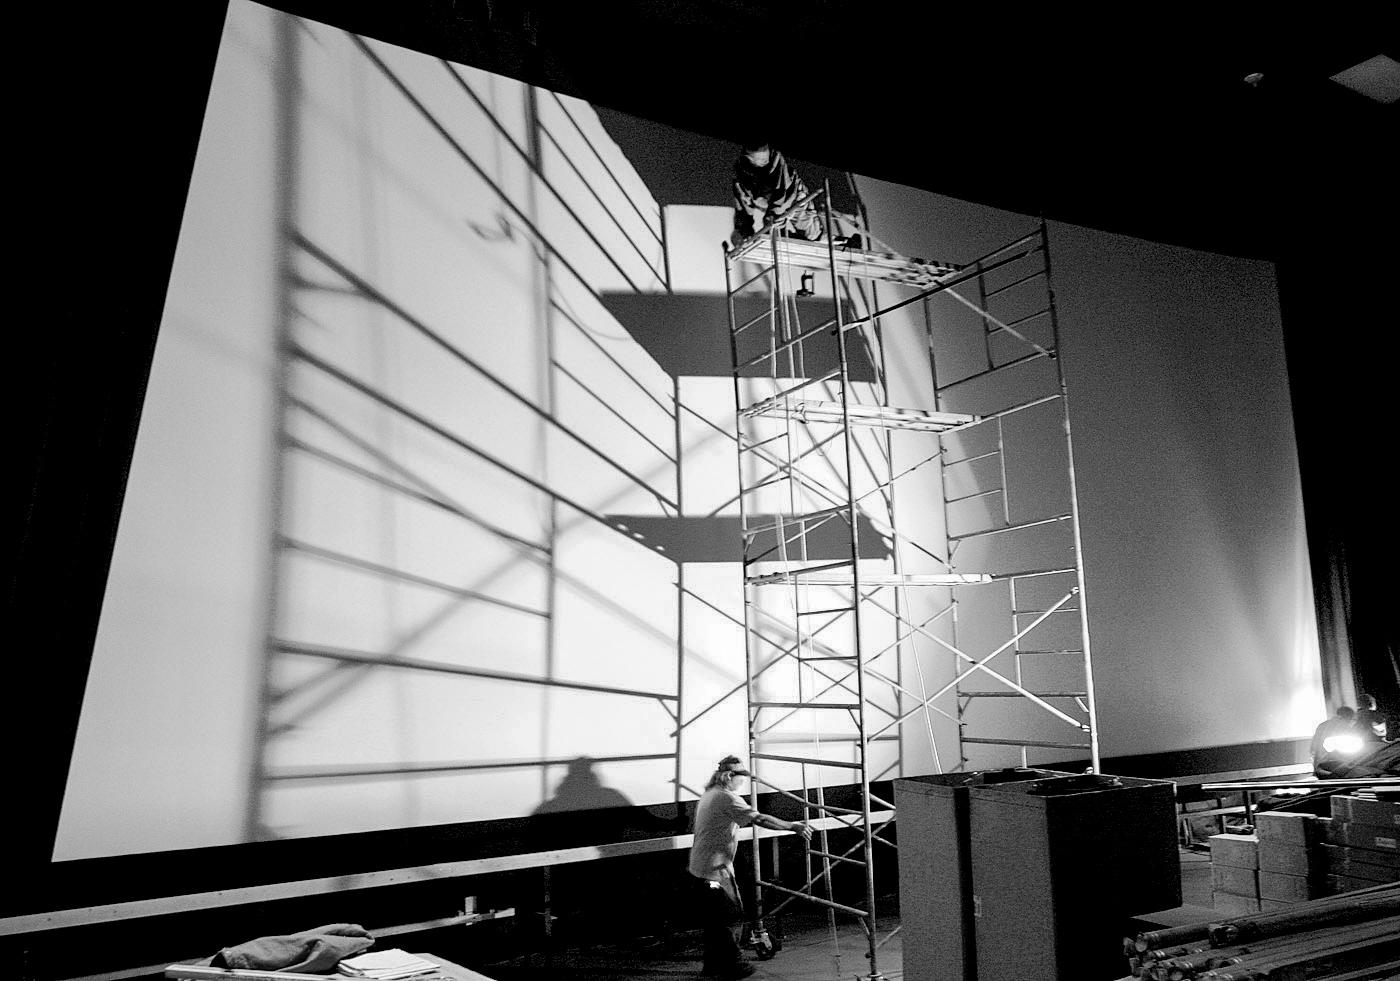 Movie theater construction